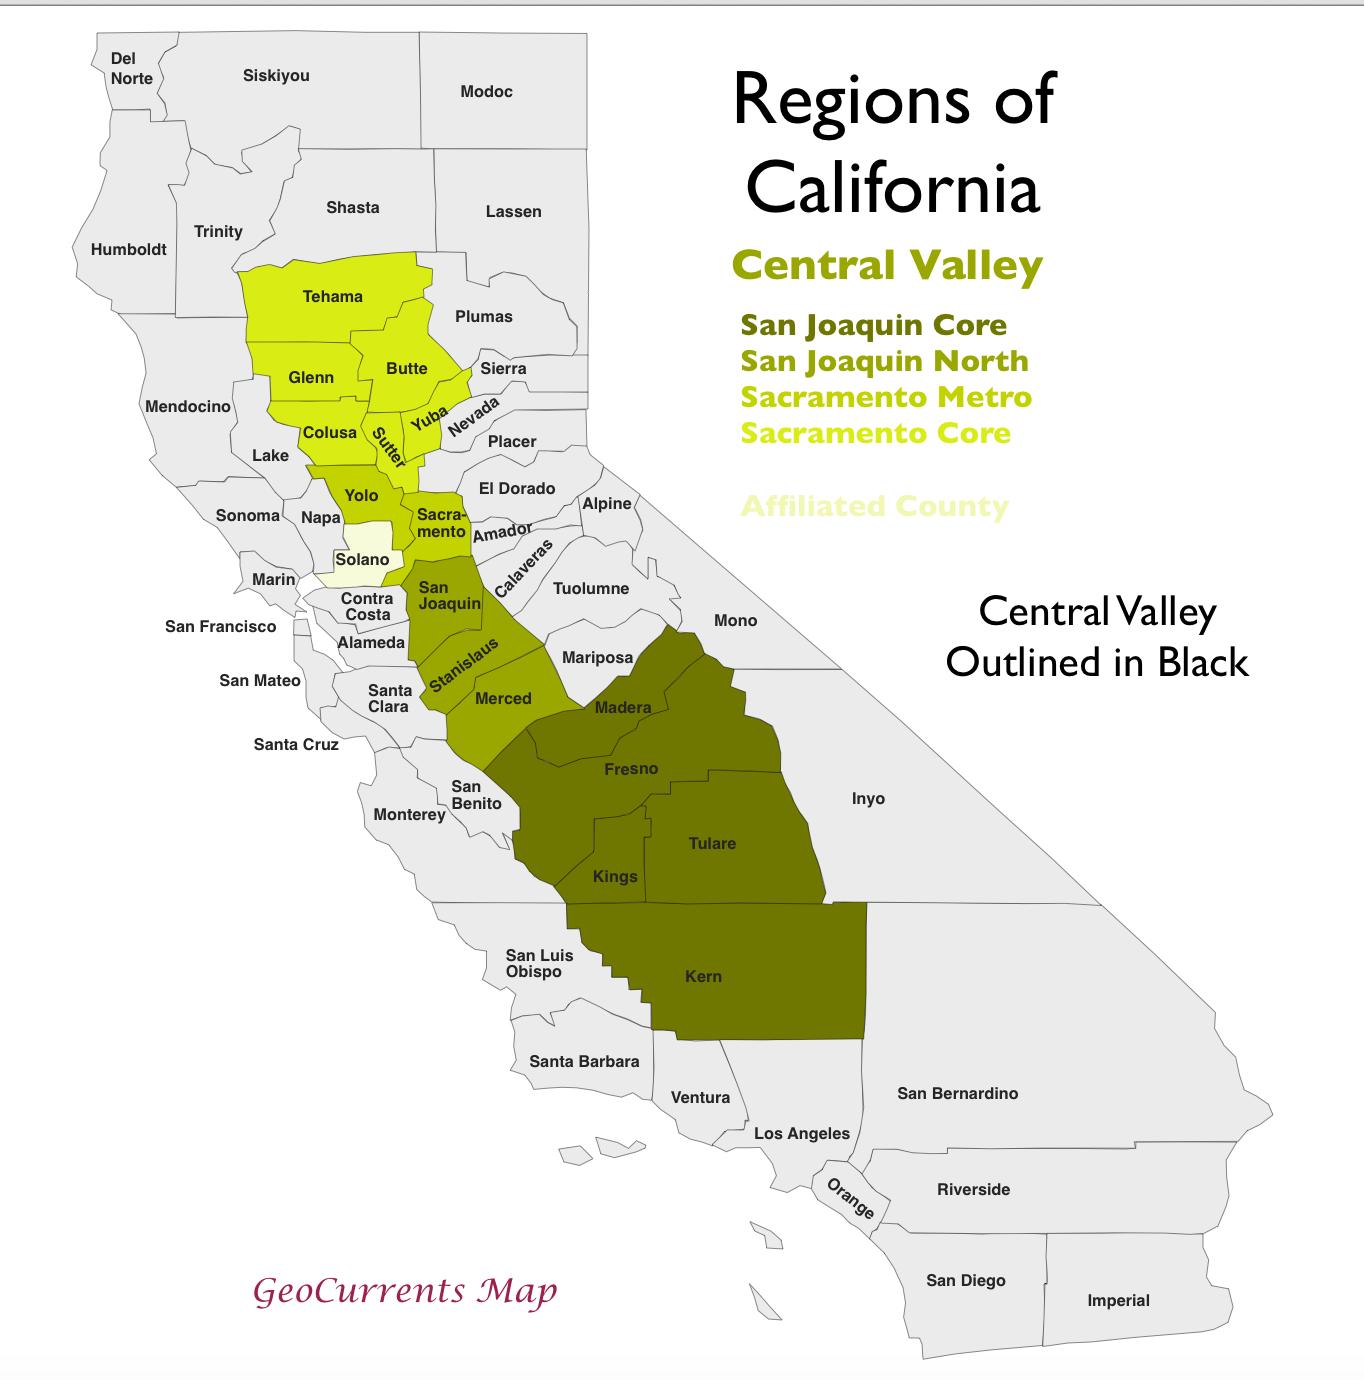 GeoCurrents Maps of the USA GeoCurrents